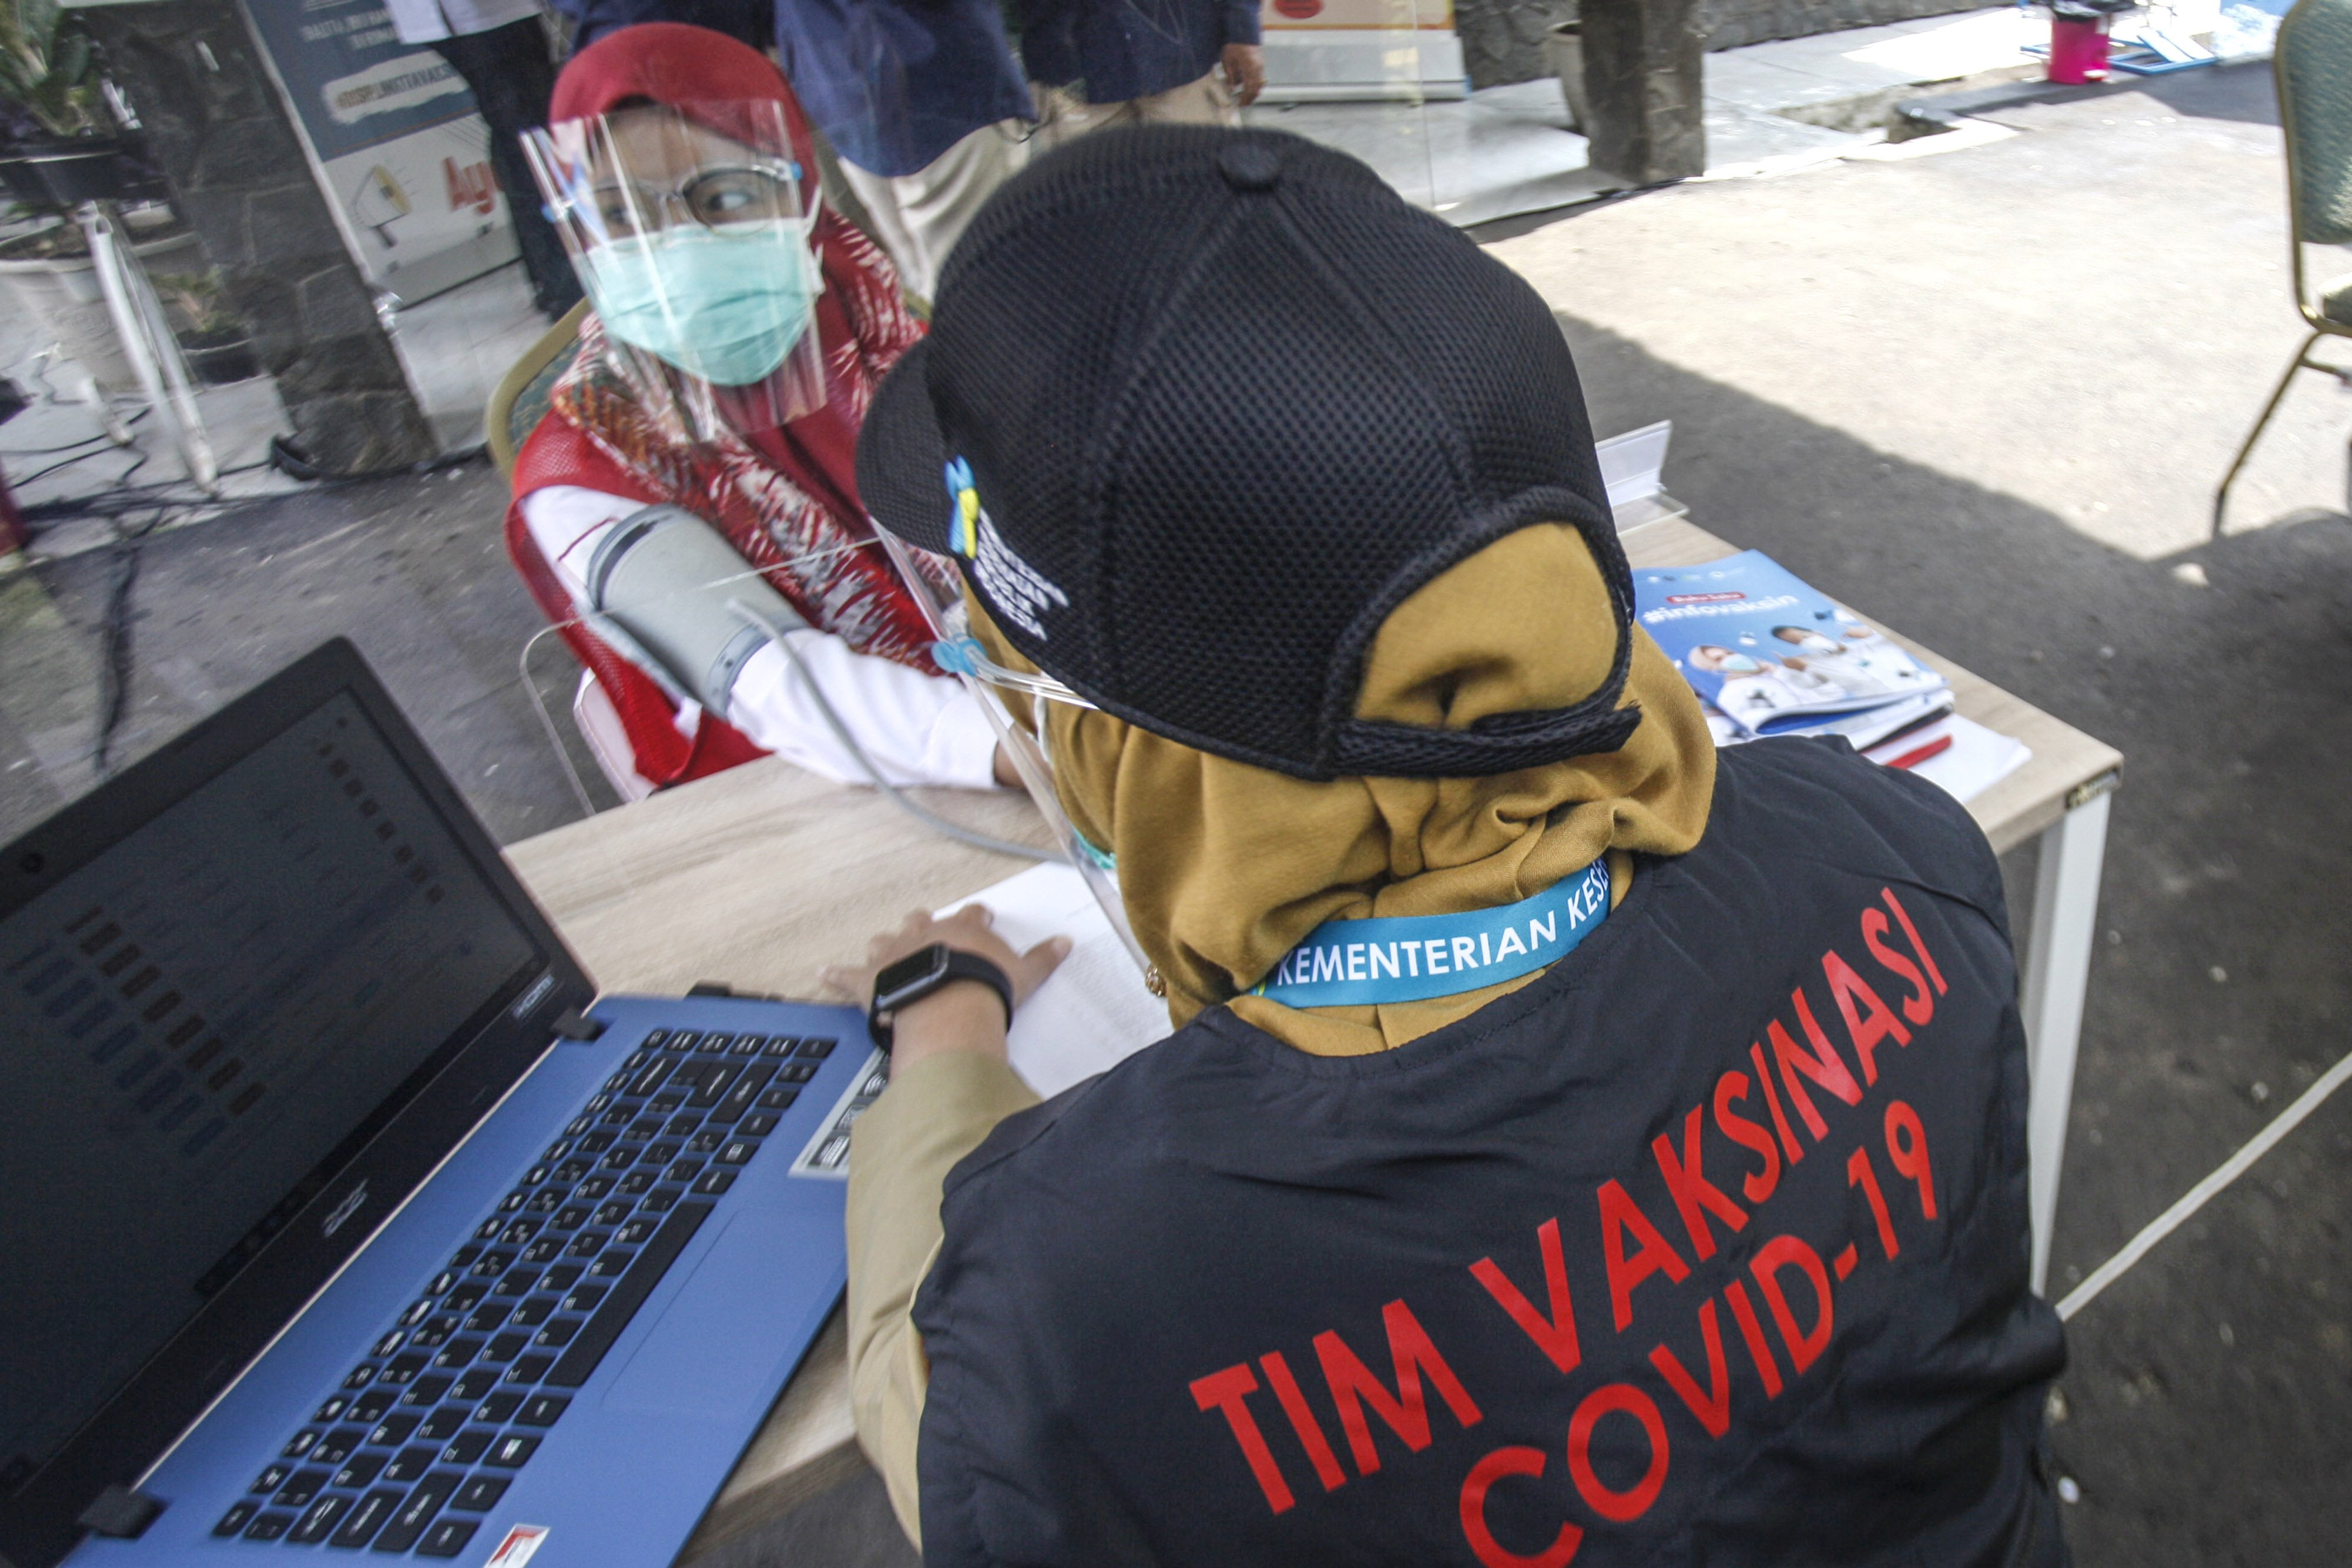 Petugas medis memeriksa kesehatan relawan sebelum di vaksin pada simulasi vaksinasi COVID-19 di Puskesamas Tanah Sareal, Kota Bogor, Jawa Barat, Rabu (18/11/2020). Menteri Kesehatan (Menkes) Terawan Agus Putranto mengatakan, pemerintah menargetkan imunisasi COVID-19 akan diberikan kepada 67 persen dari 160 juta penduduk berusia 18-59 tahun atau sebanyak 107,2 juta orang, pemberian vaksinasi akan dilakukan melalui skema vaksin program dan vaksin mandiri.